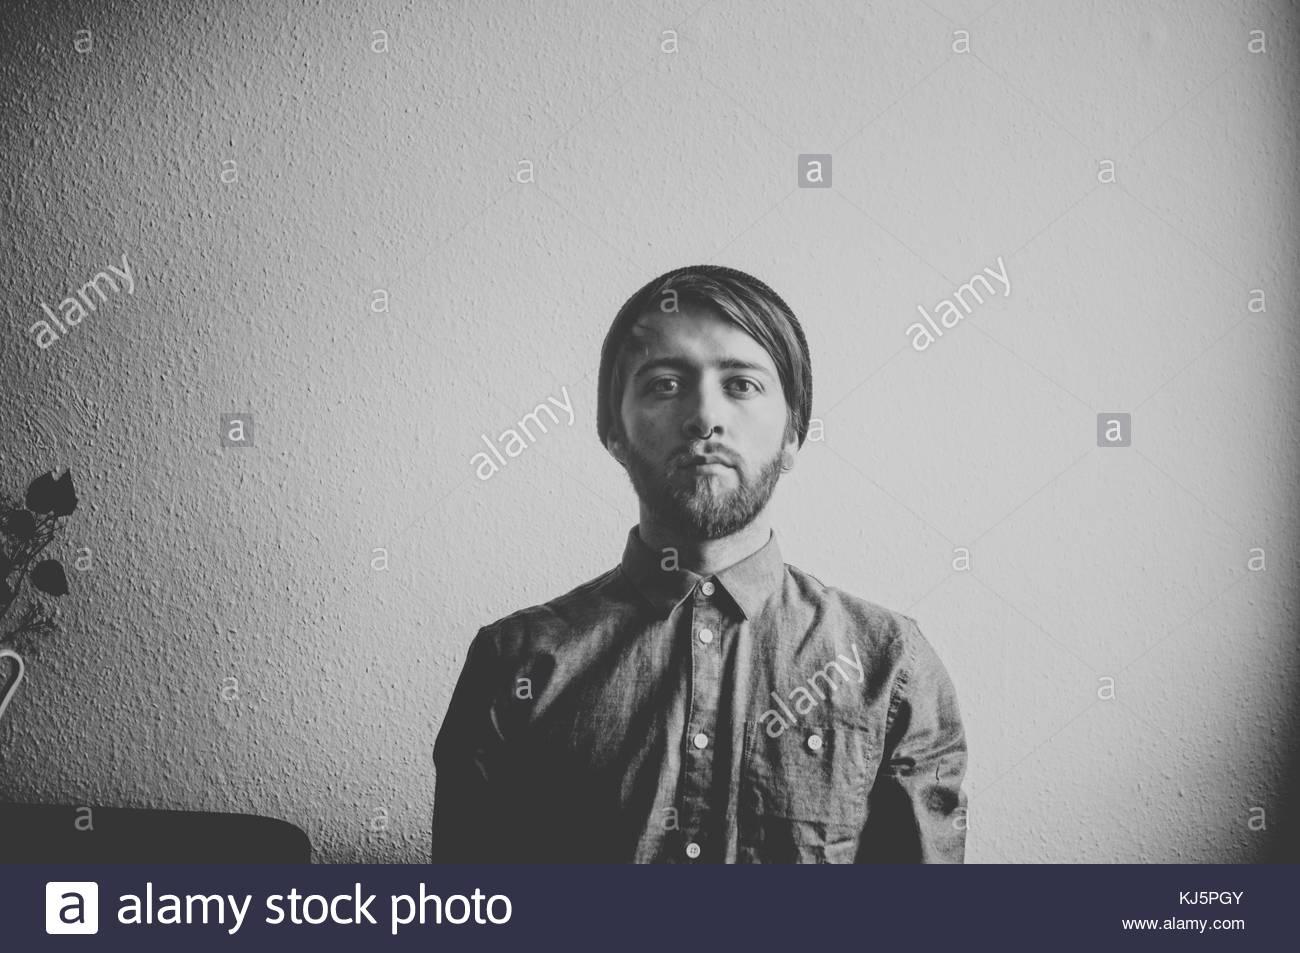 Retrato de joven en camisa Imagen De Stock